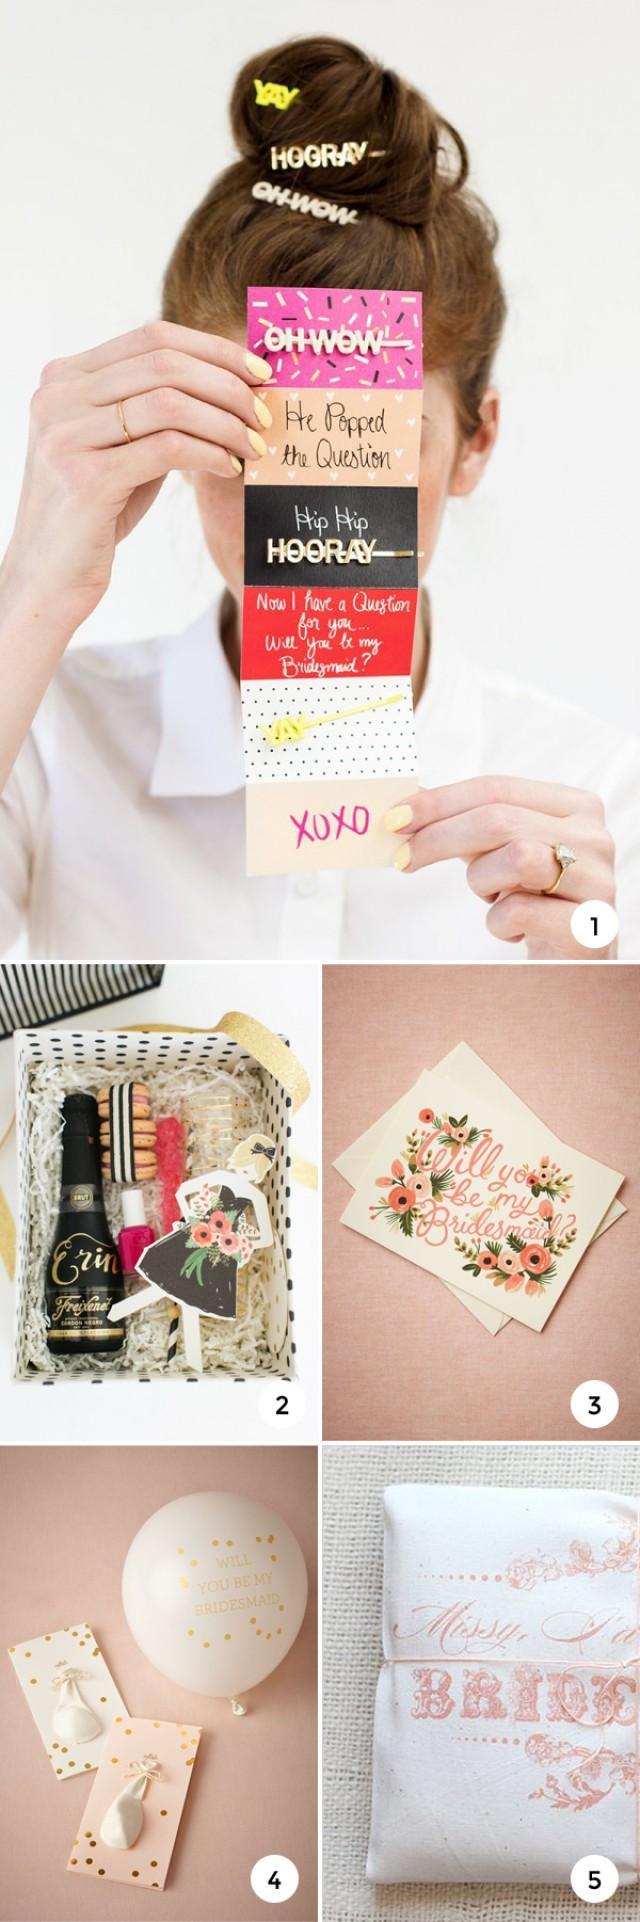 5 Will You Be My Bridesmaid Ideas Weddbook